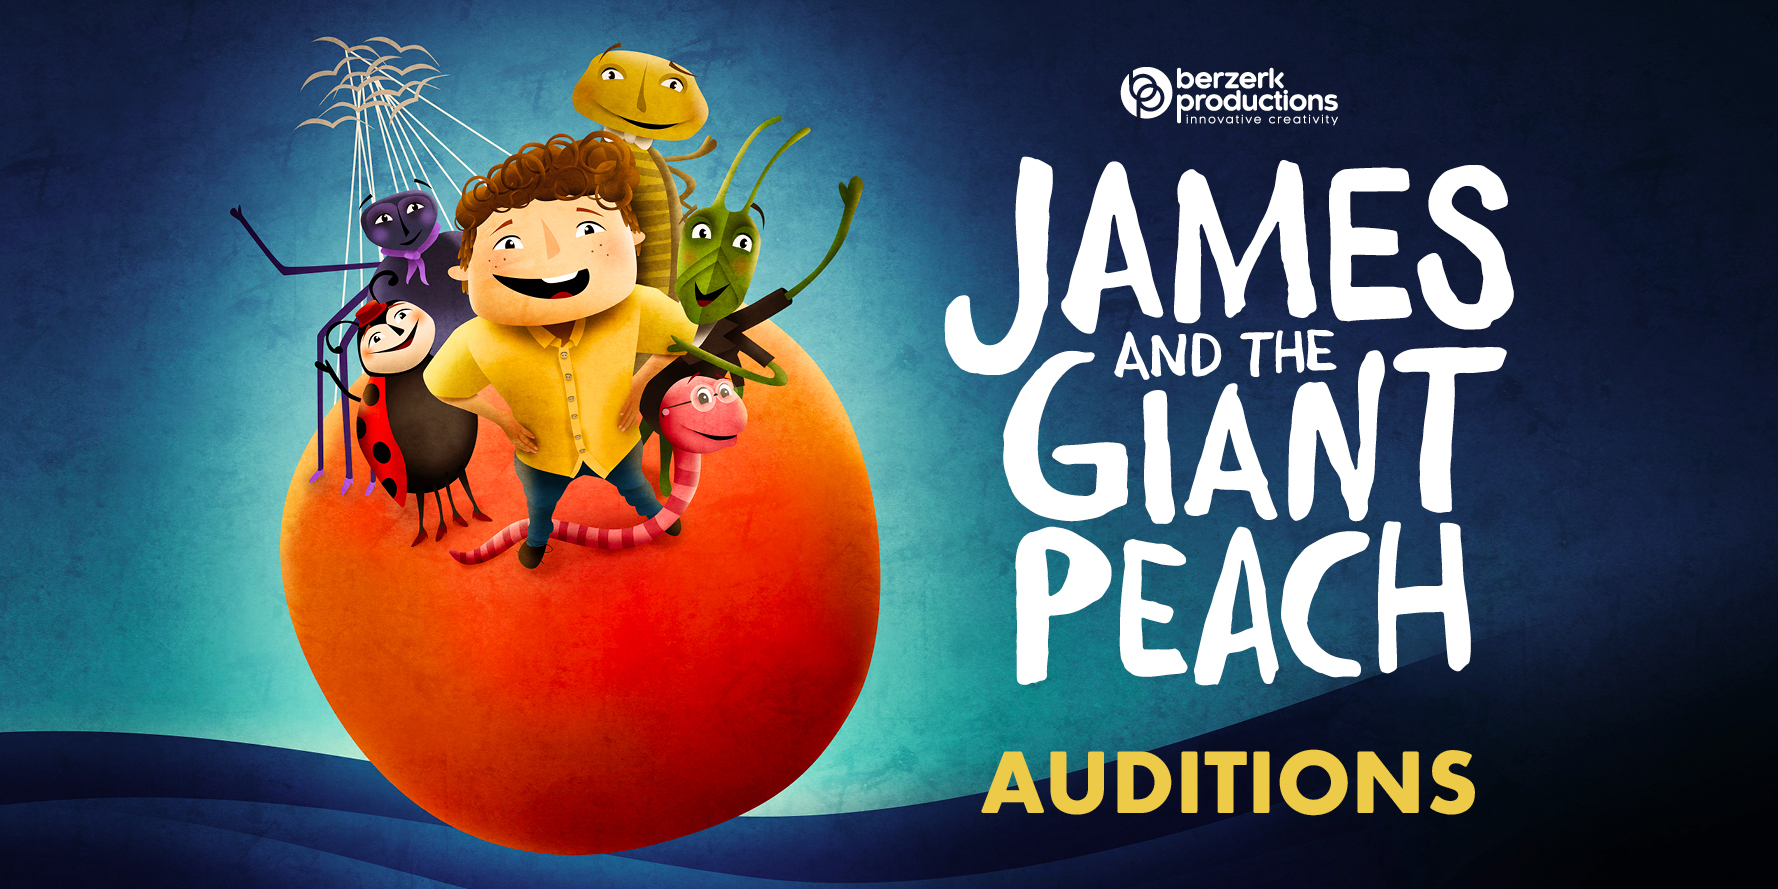 berzerk-james-and-the-giant-peach-scroller